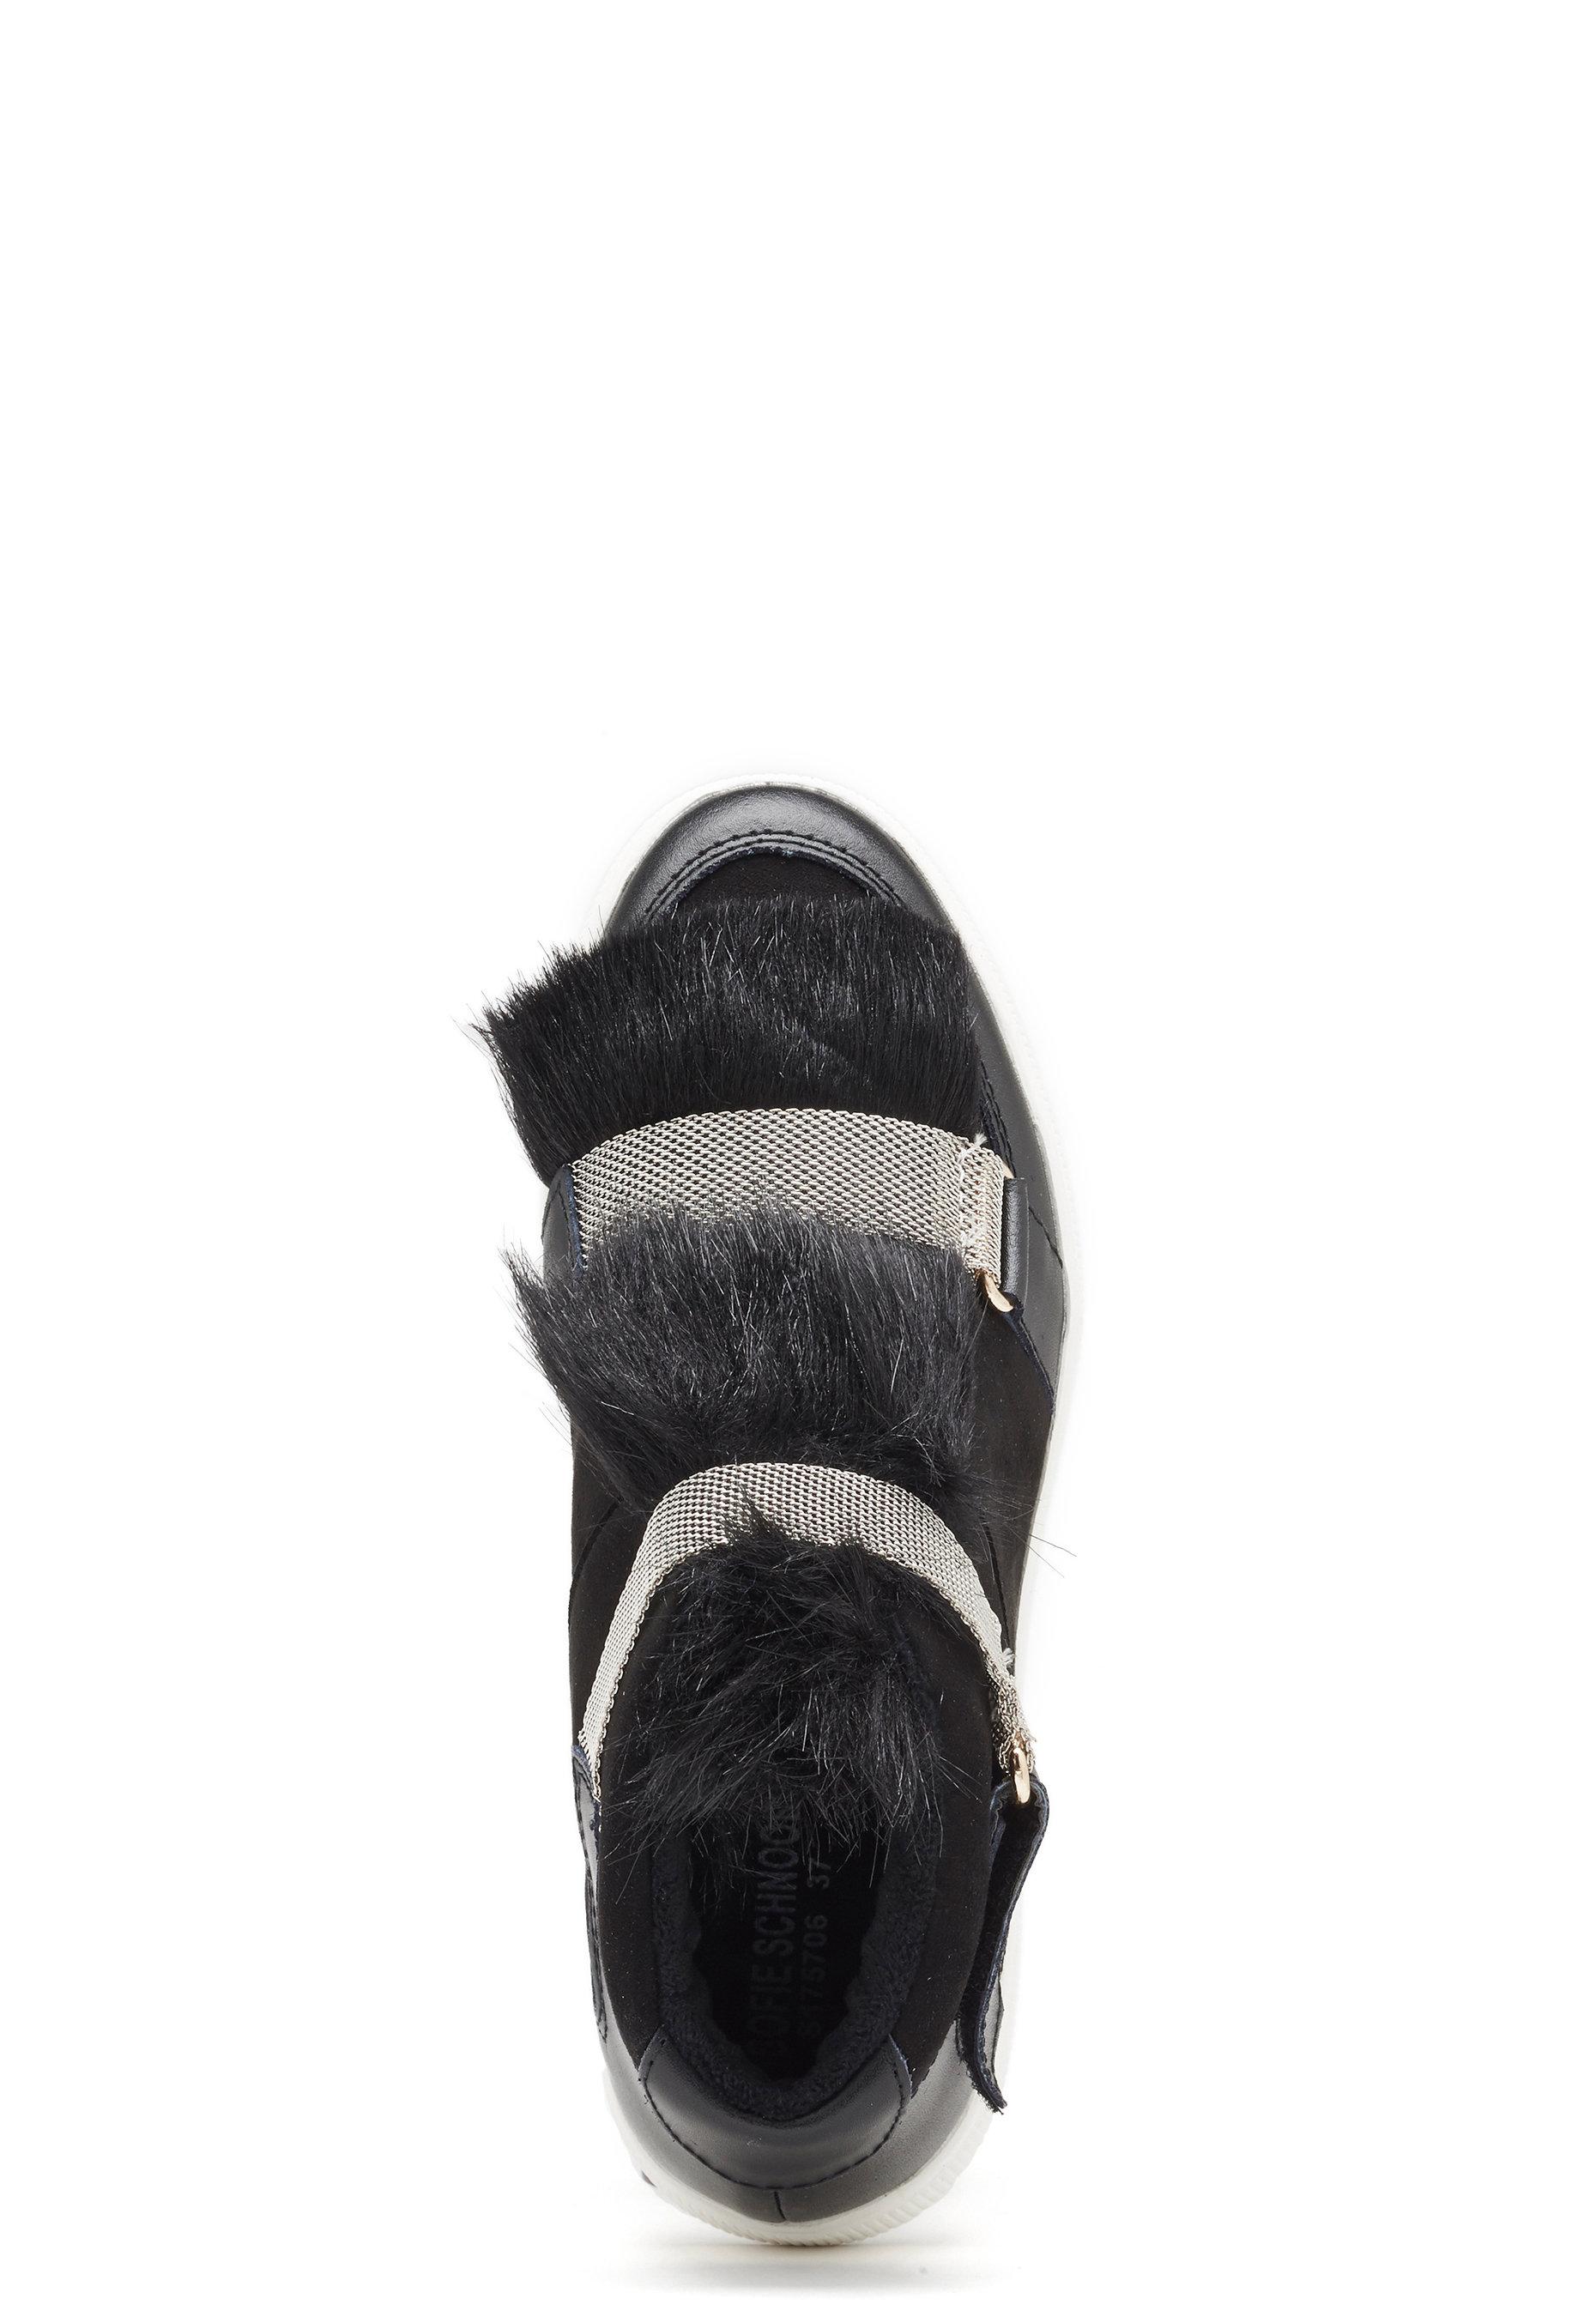 203e539972b SOFIE SCHNOOR Boot With Fur Black - Bubbleroom